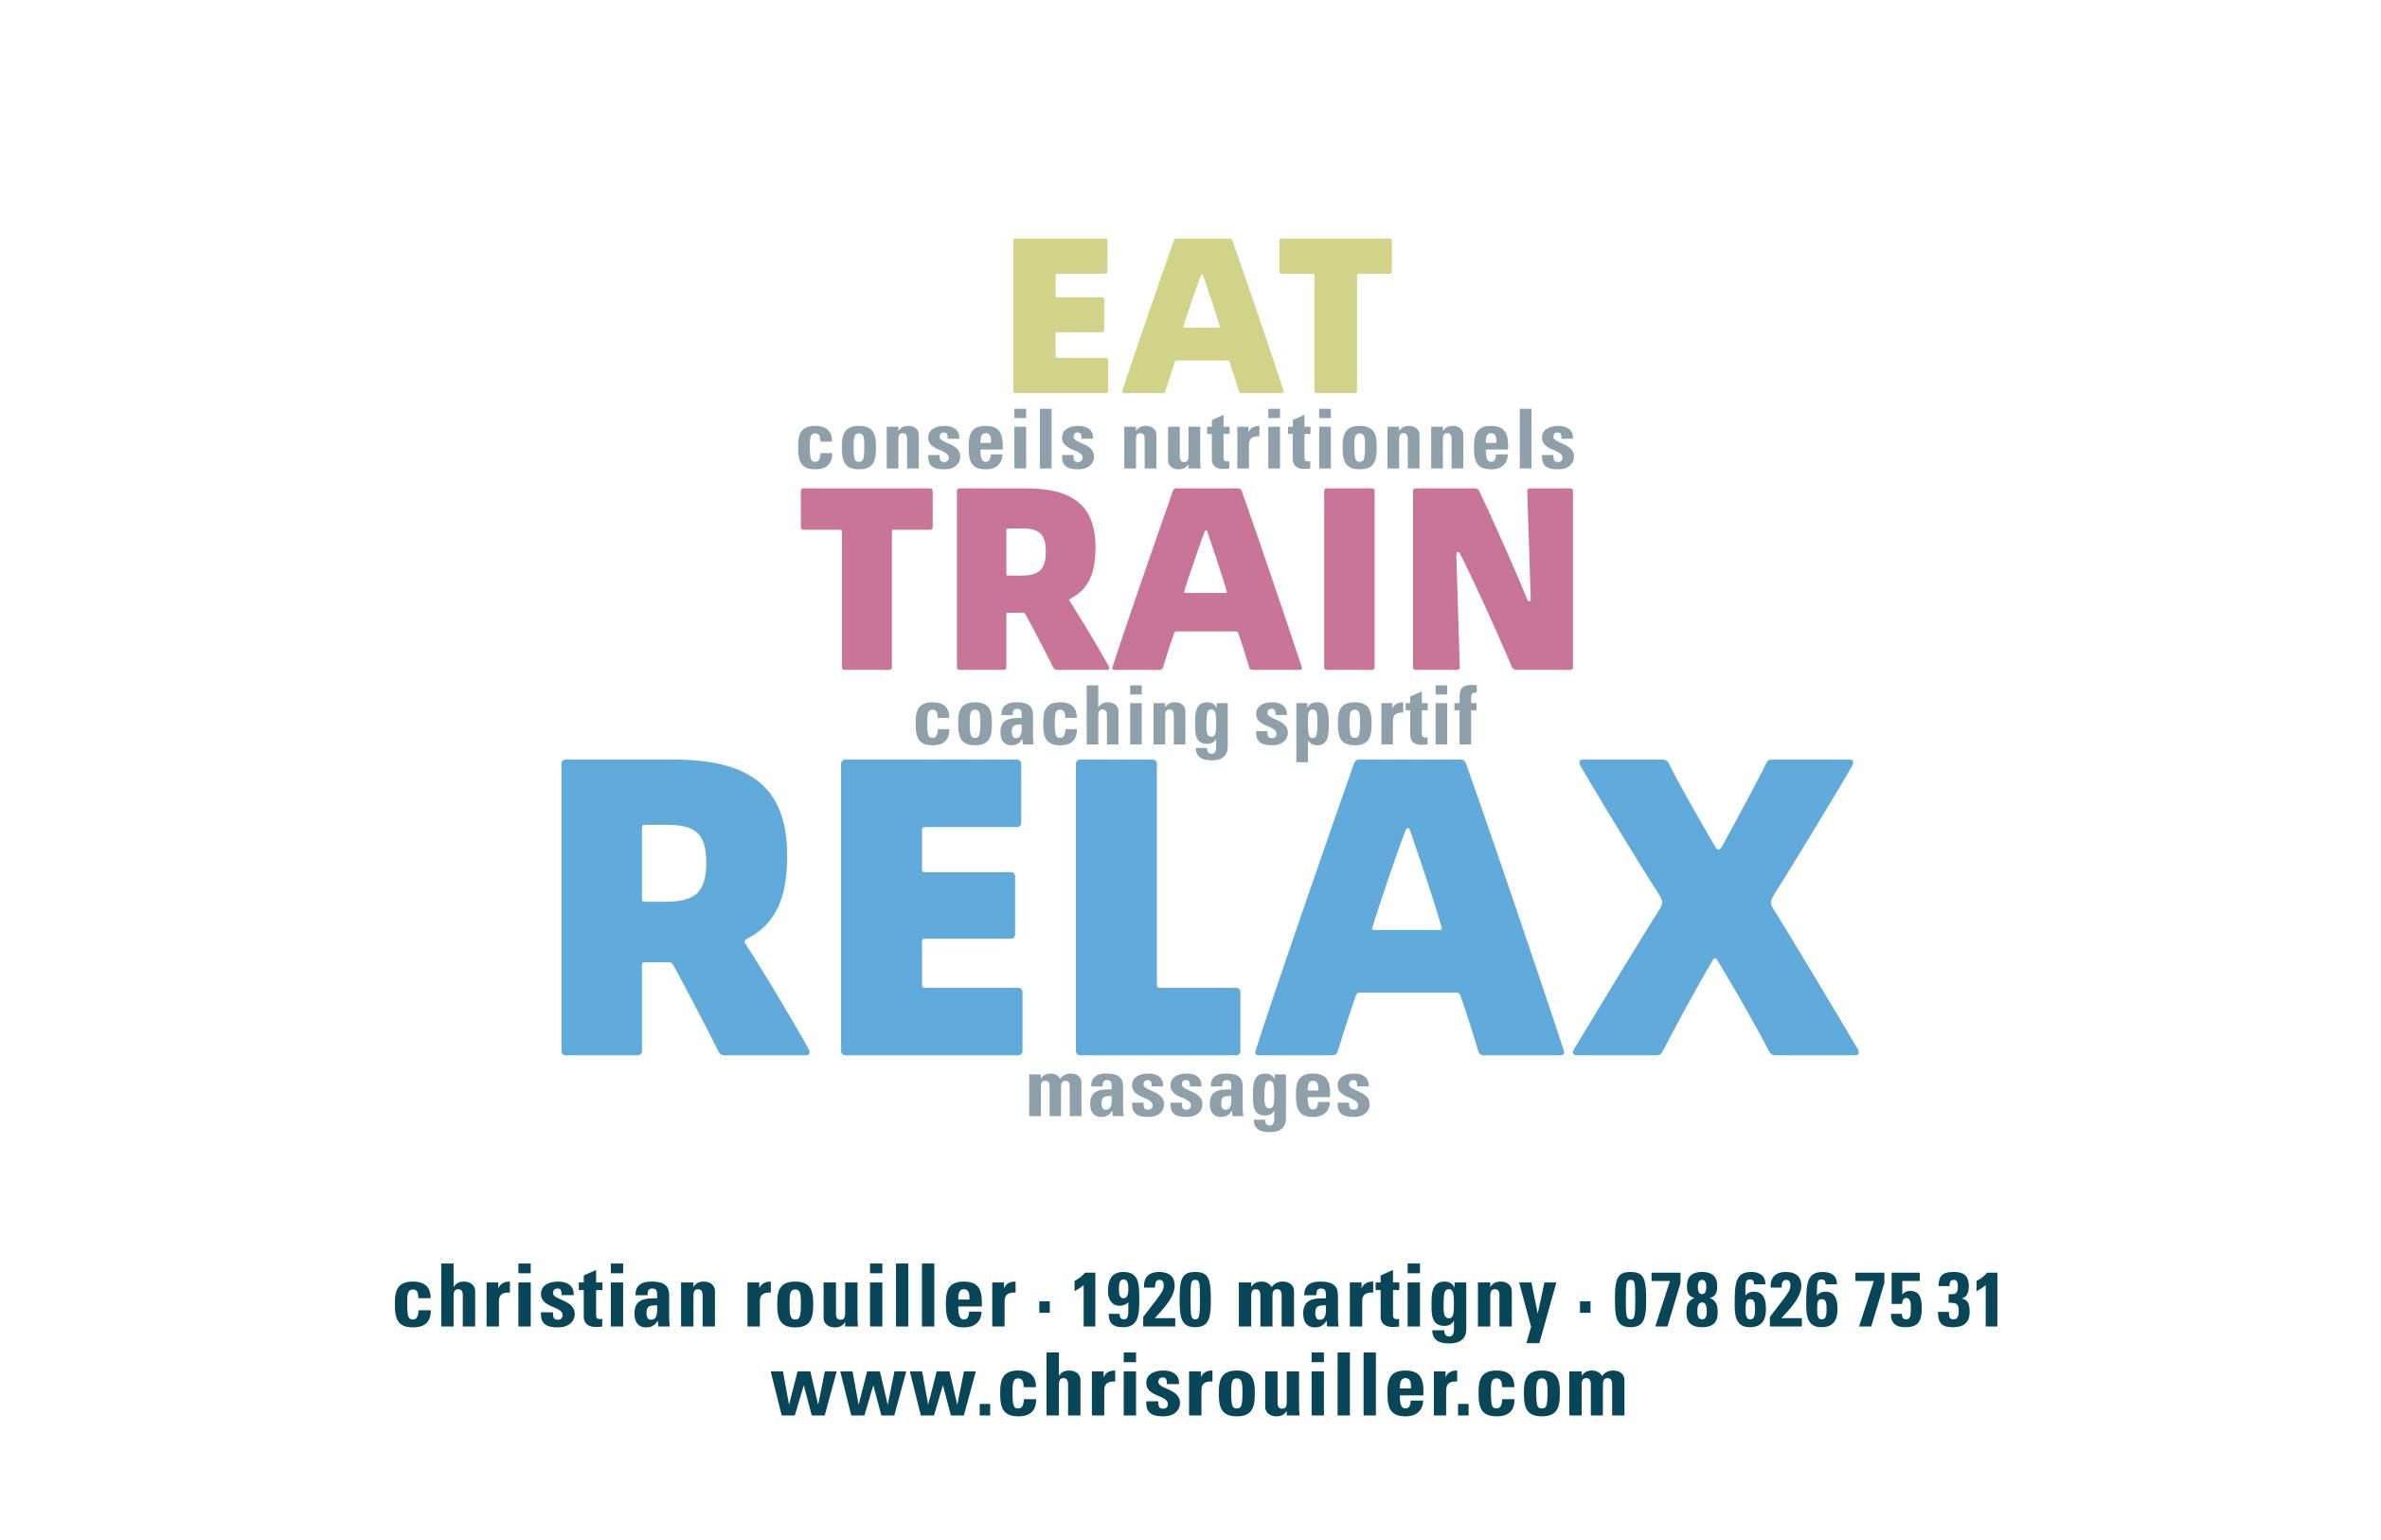 Christian Rouiller Massages et Coaching sportif